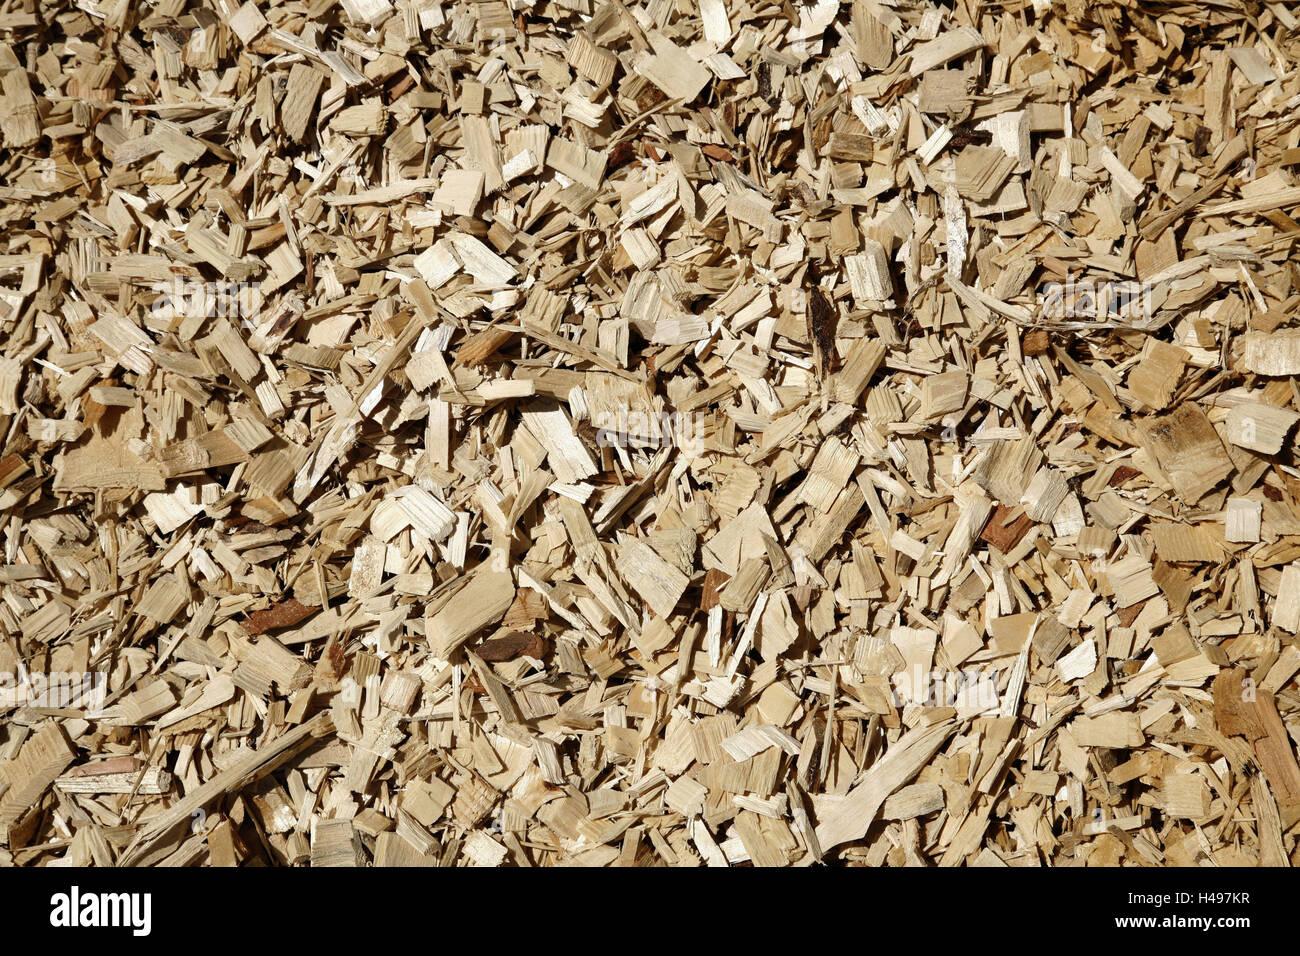 Hack cutlet, medium close-up, wooden, heating, wooden heating, hack cutlet heating, efficiency, environment, environmental - Stock Image